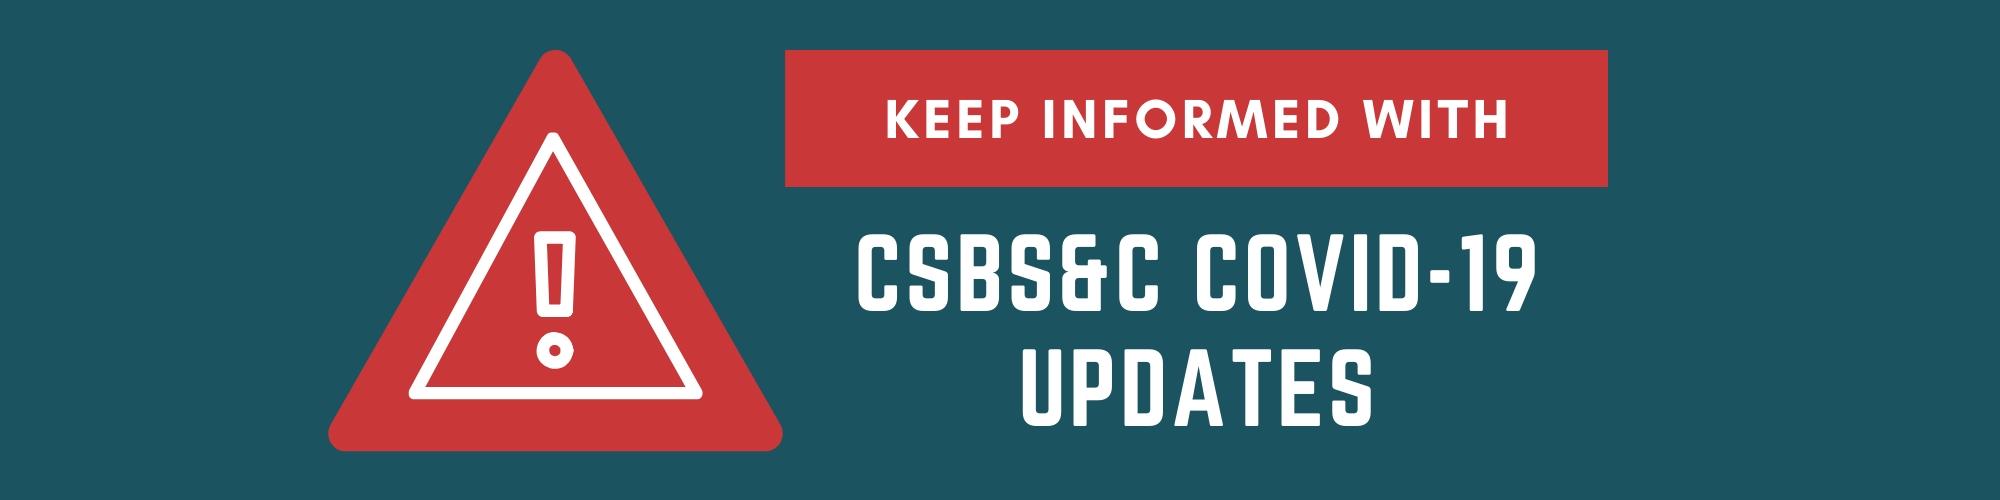 CSBS&C COVID-19 updates